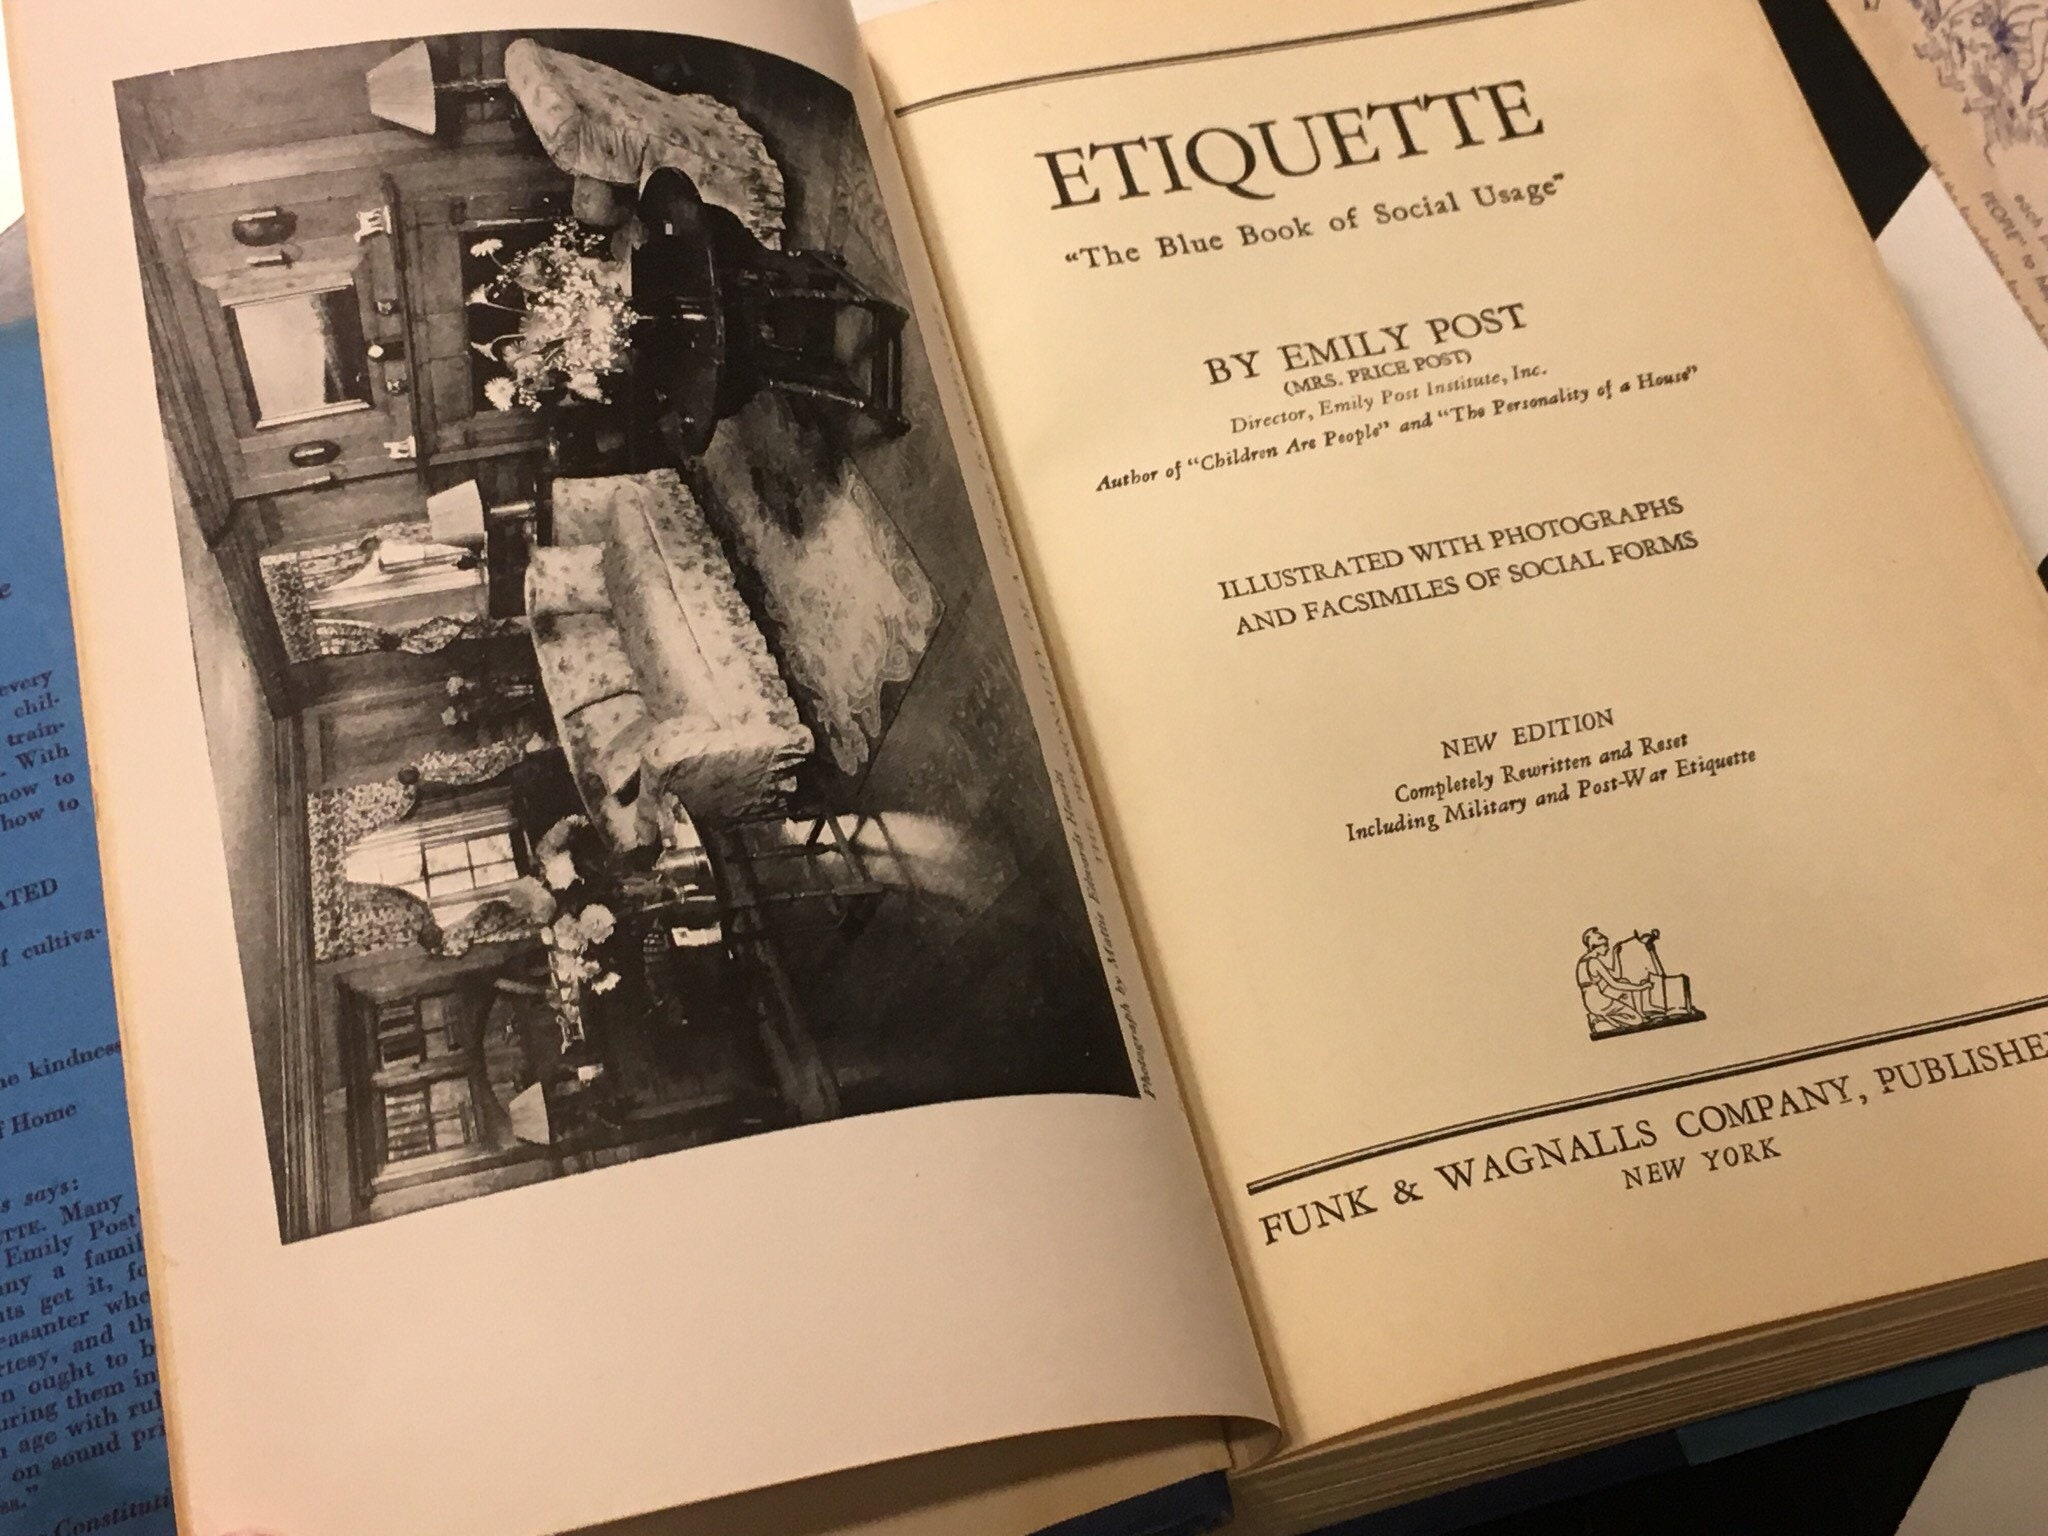 Ask Emily Post Etiquette: Emily Post's Etiquette: The Blue Book Of Social Usage